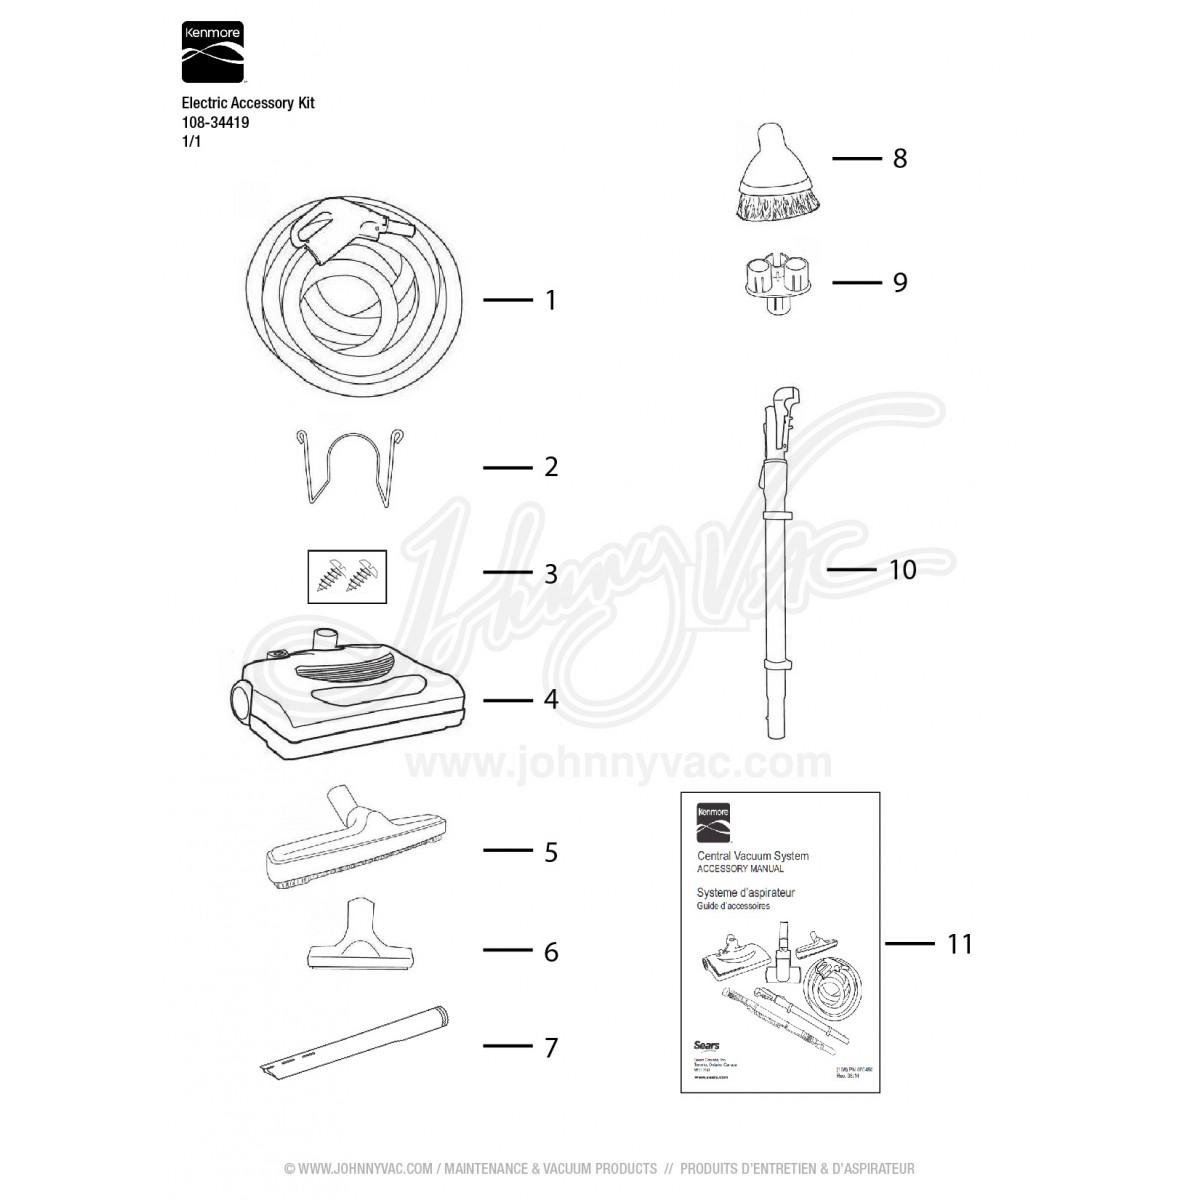 Kenmore Vacuum Electric Accessory Kit 108